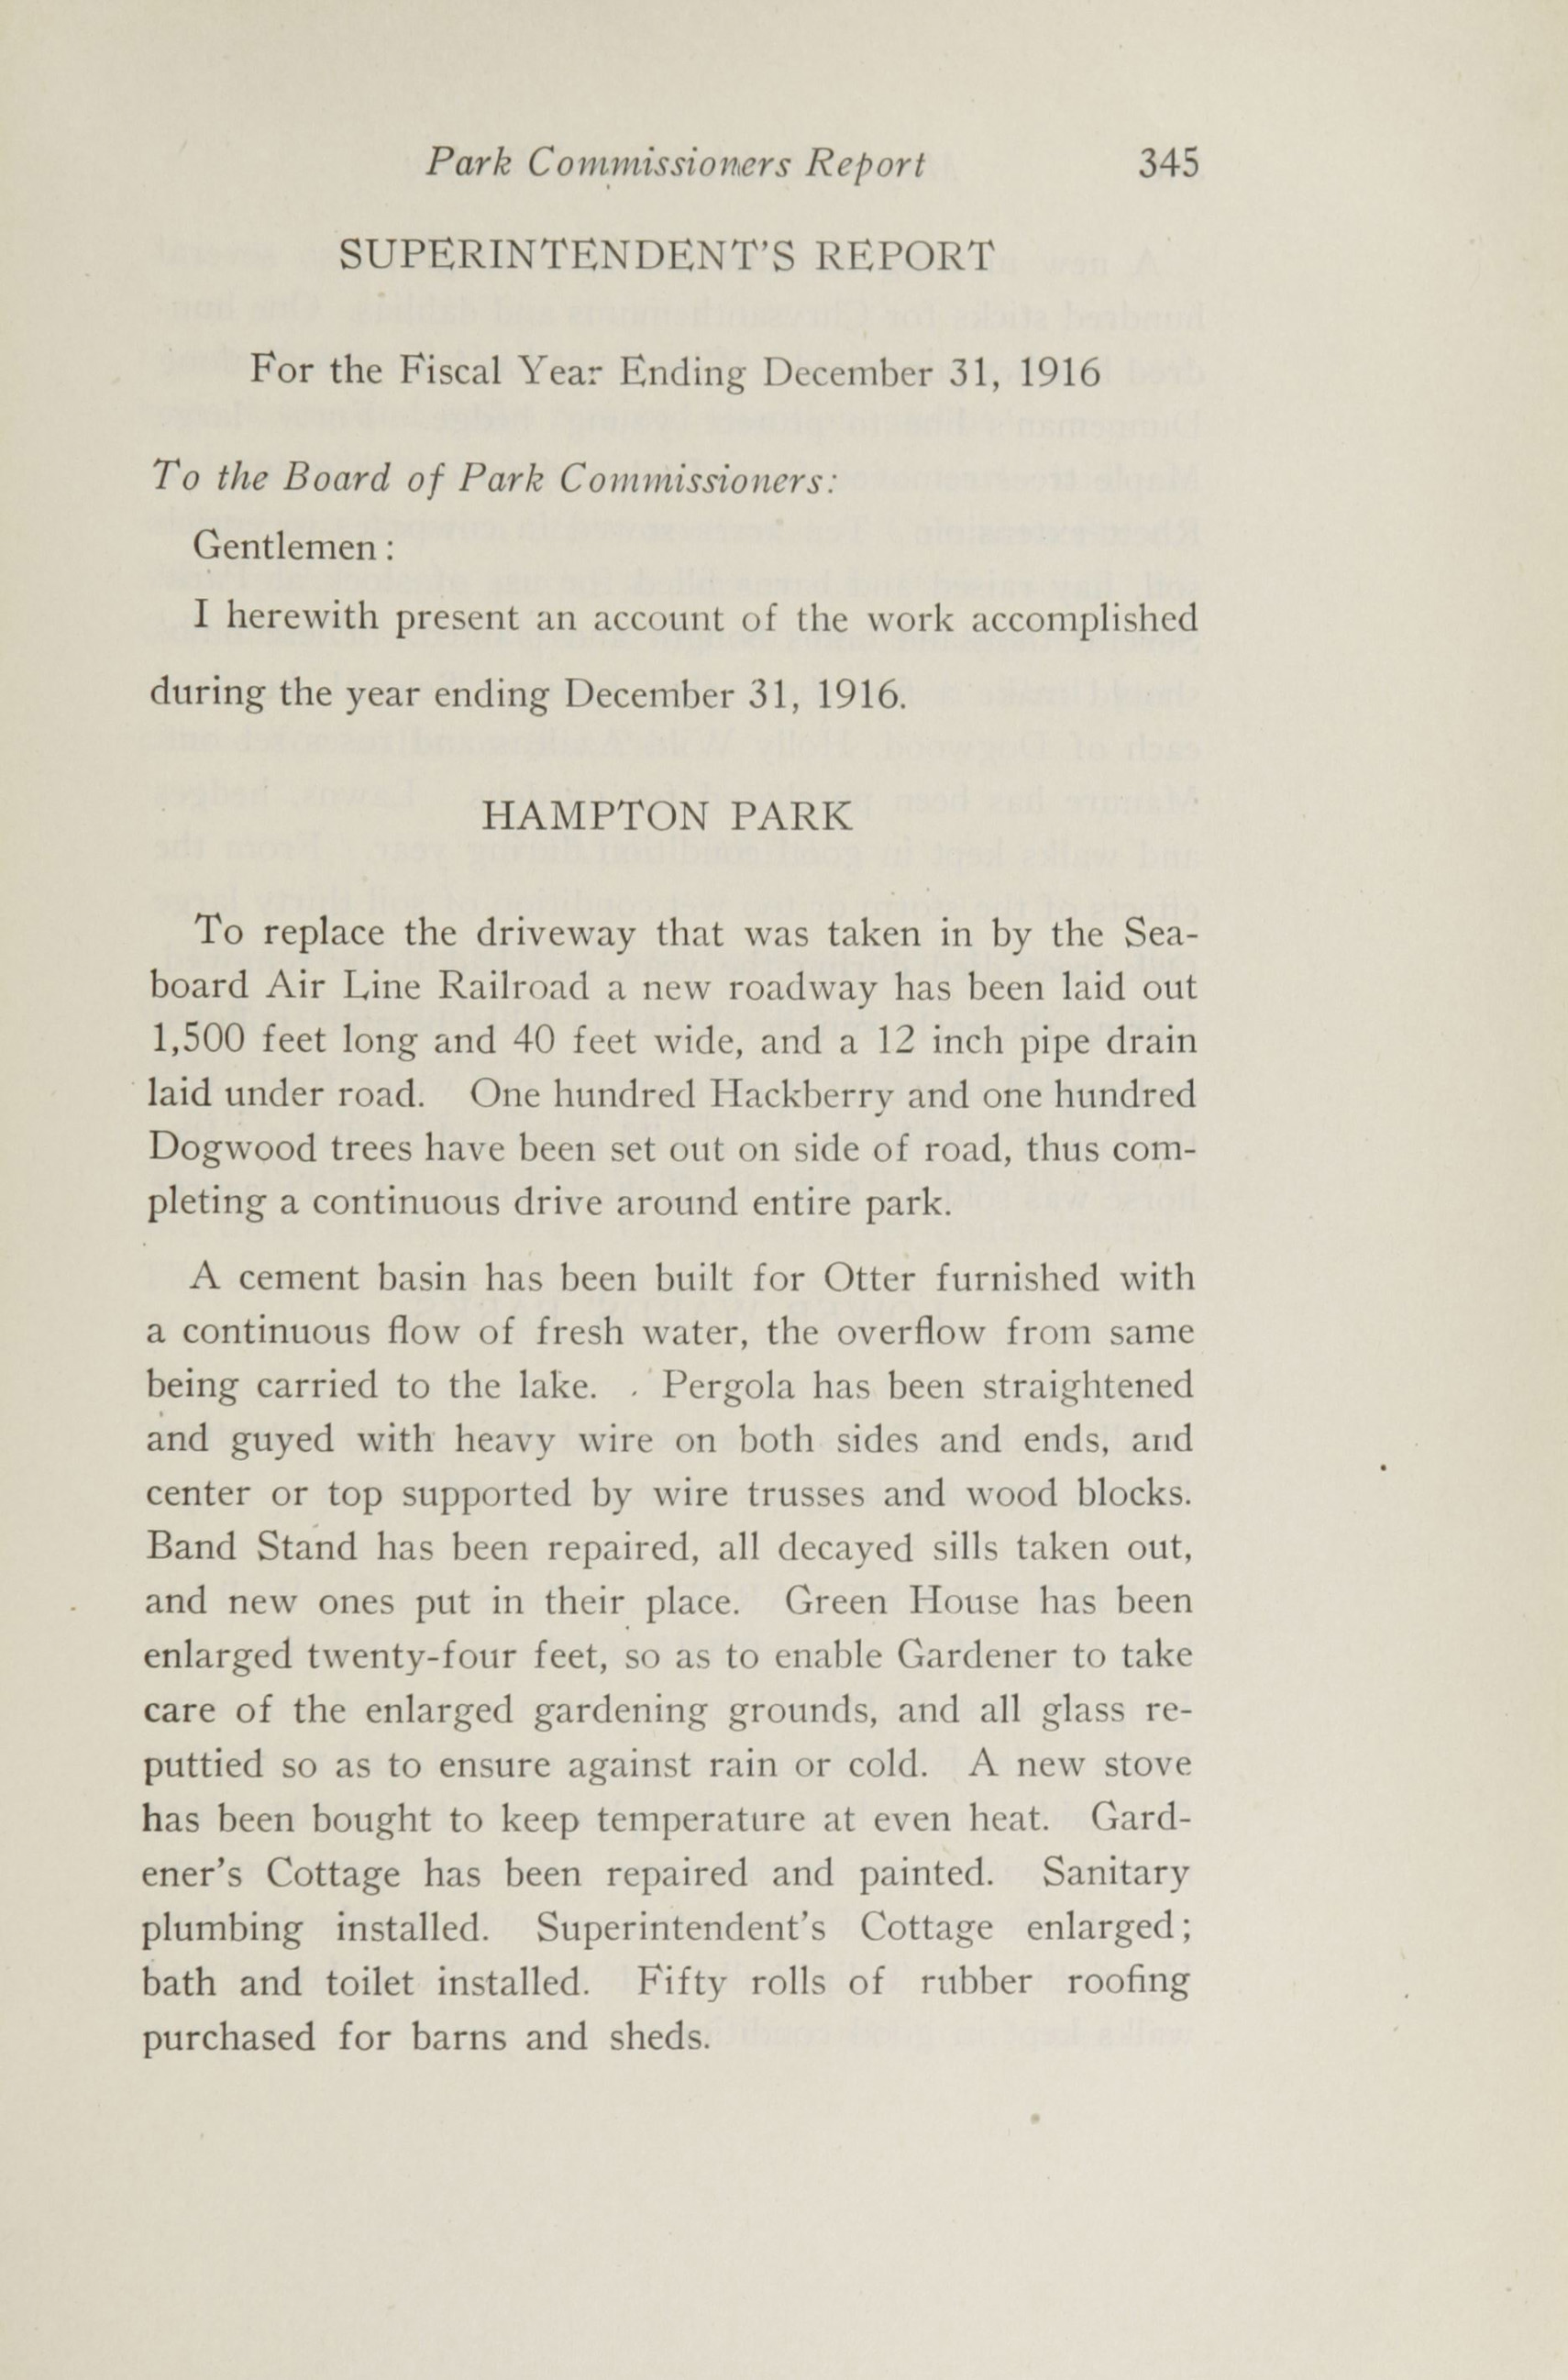 Charleston Yearbook, 1916, page 345